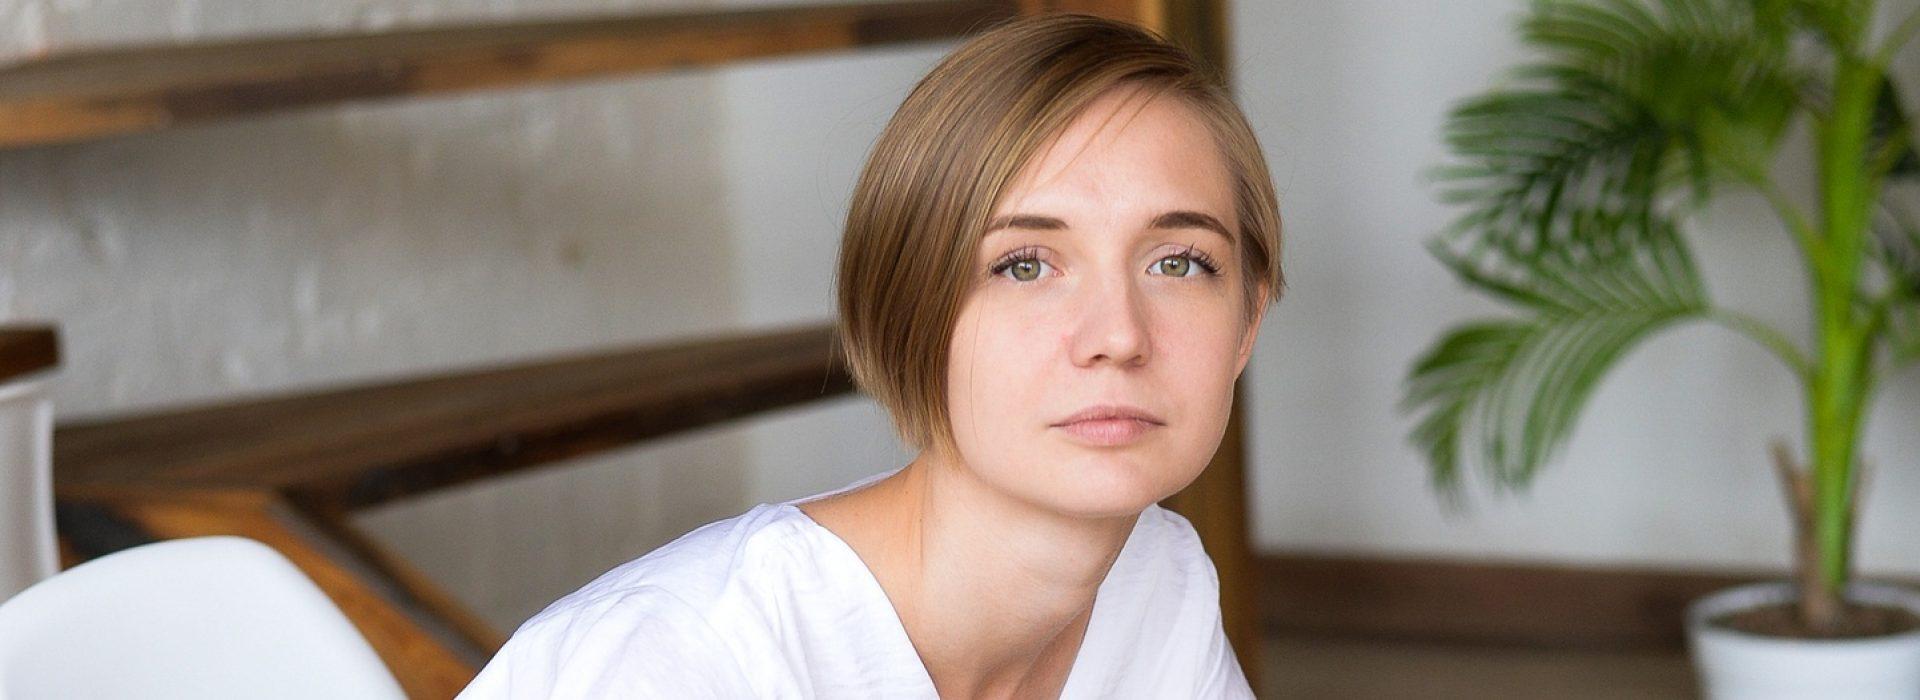 Психолог Логинова Елена Владимировна